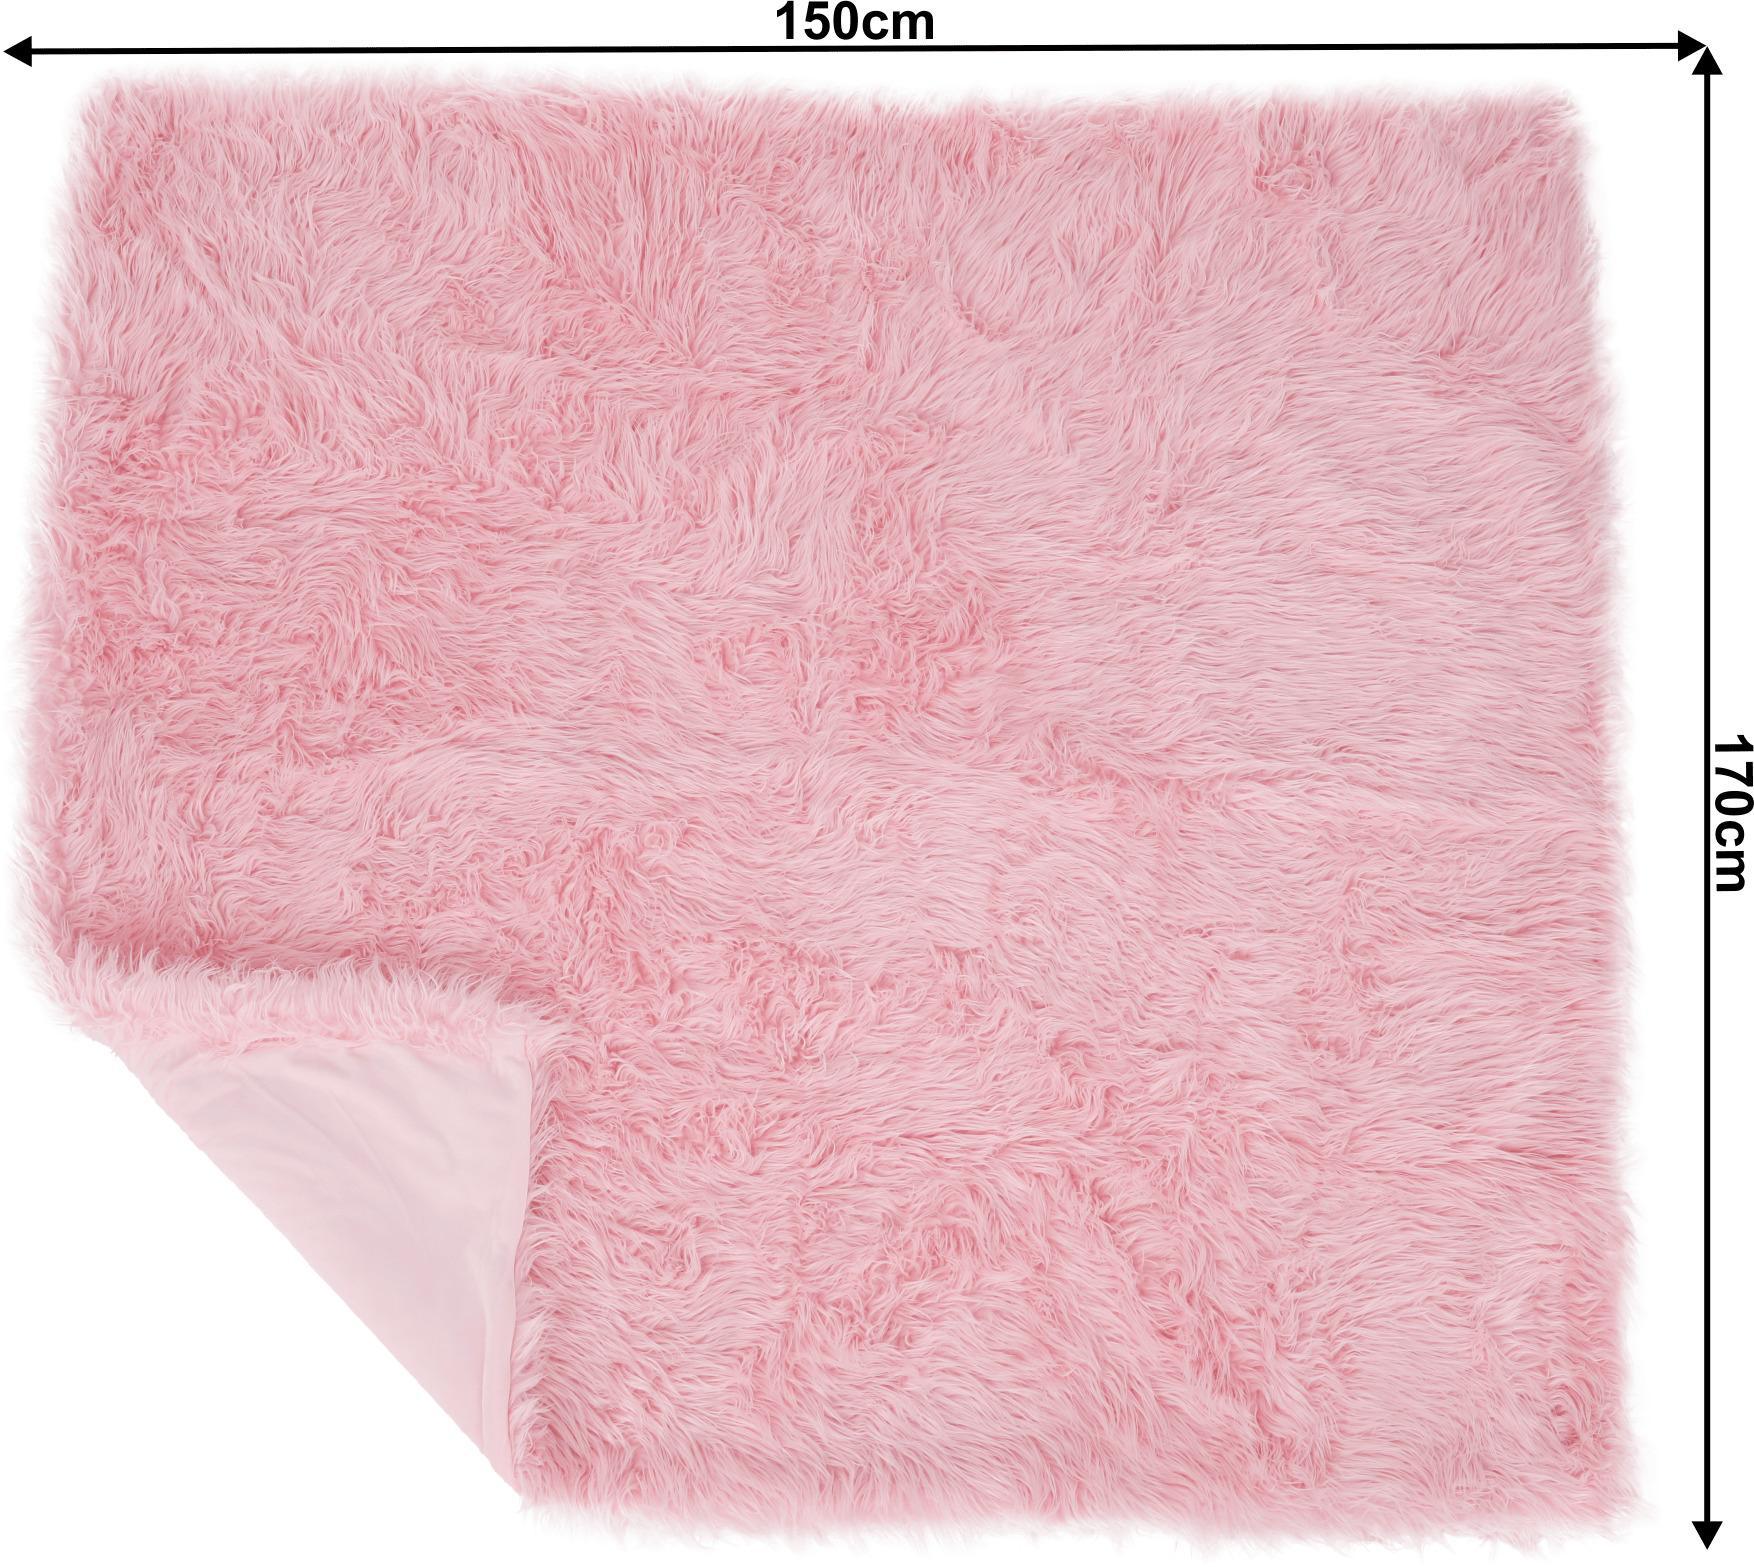 Kožušinová deka, ružová, 150x170, EBONA TYP 7